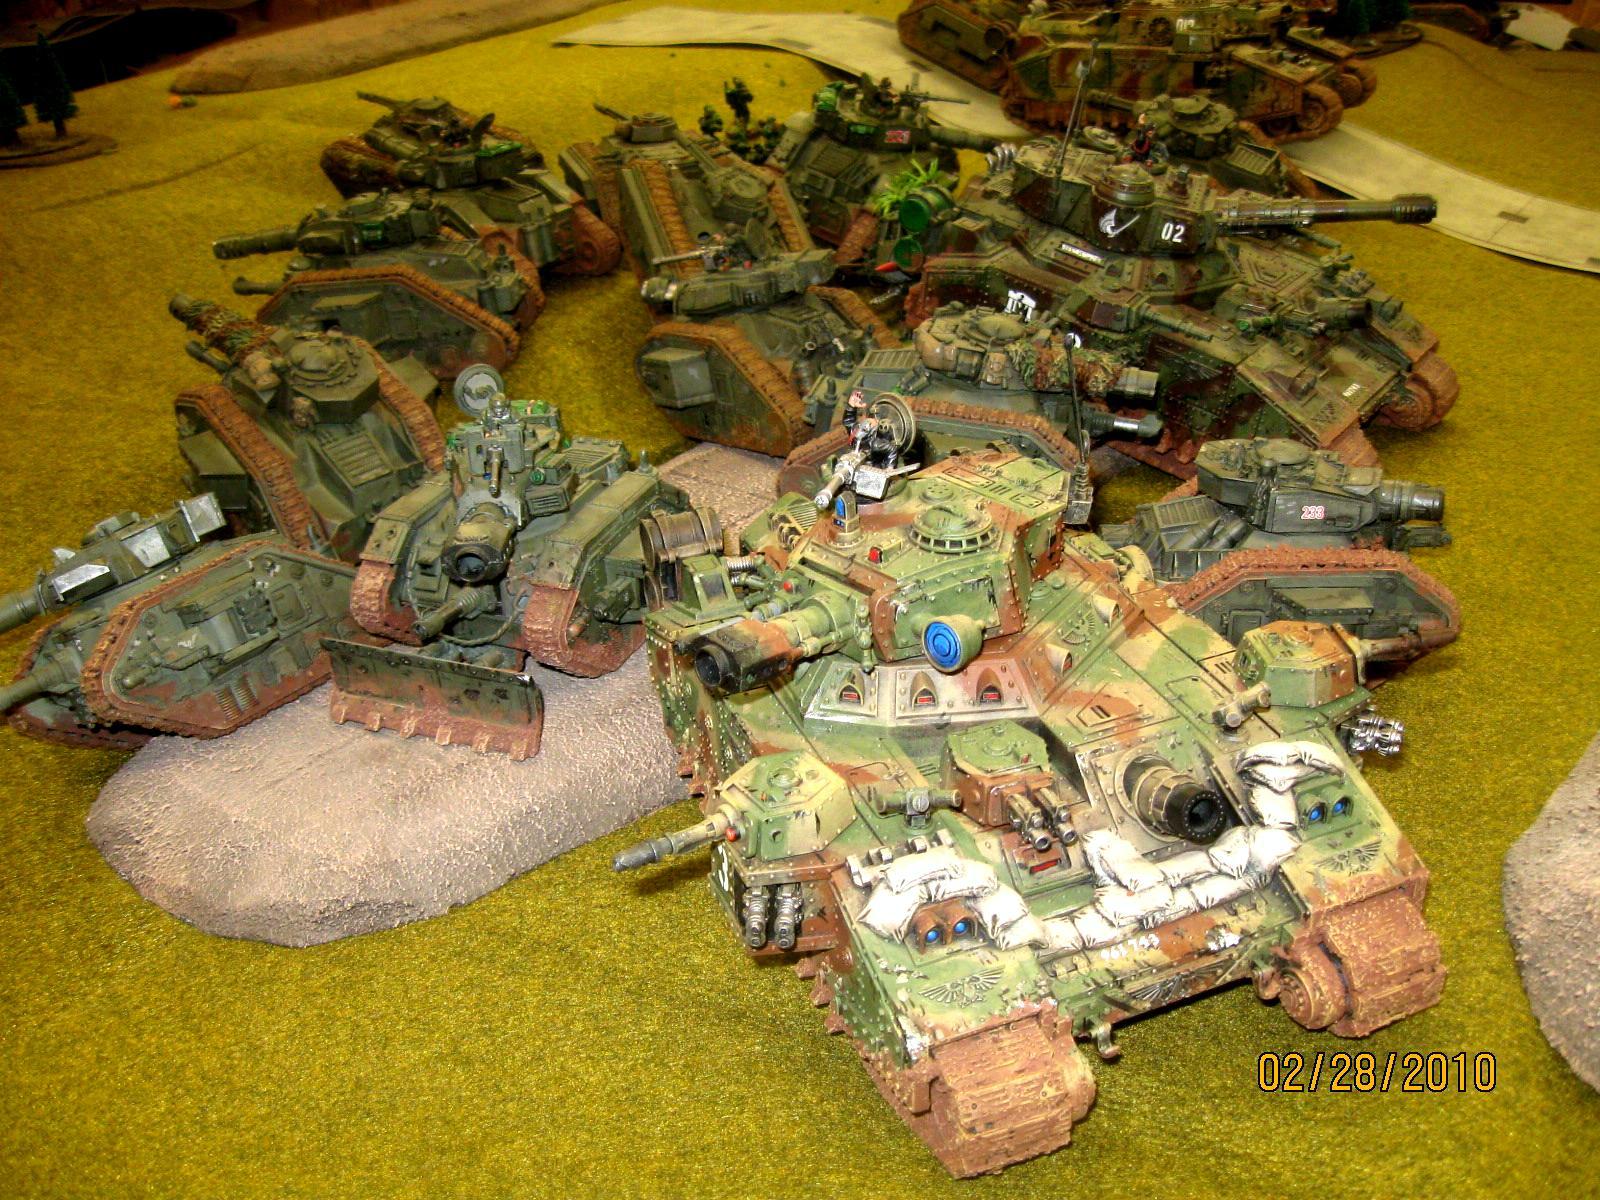 Apocalypse, Imperial Guard, Tank, Warhammer 40,000